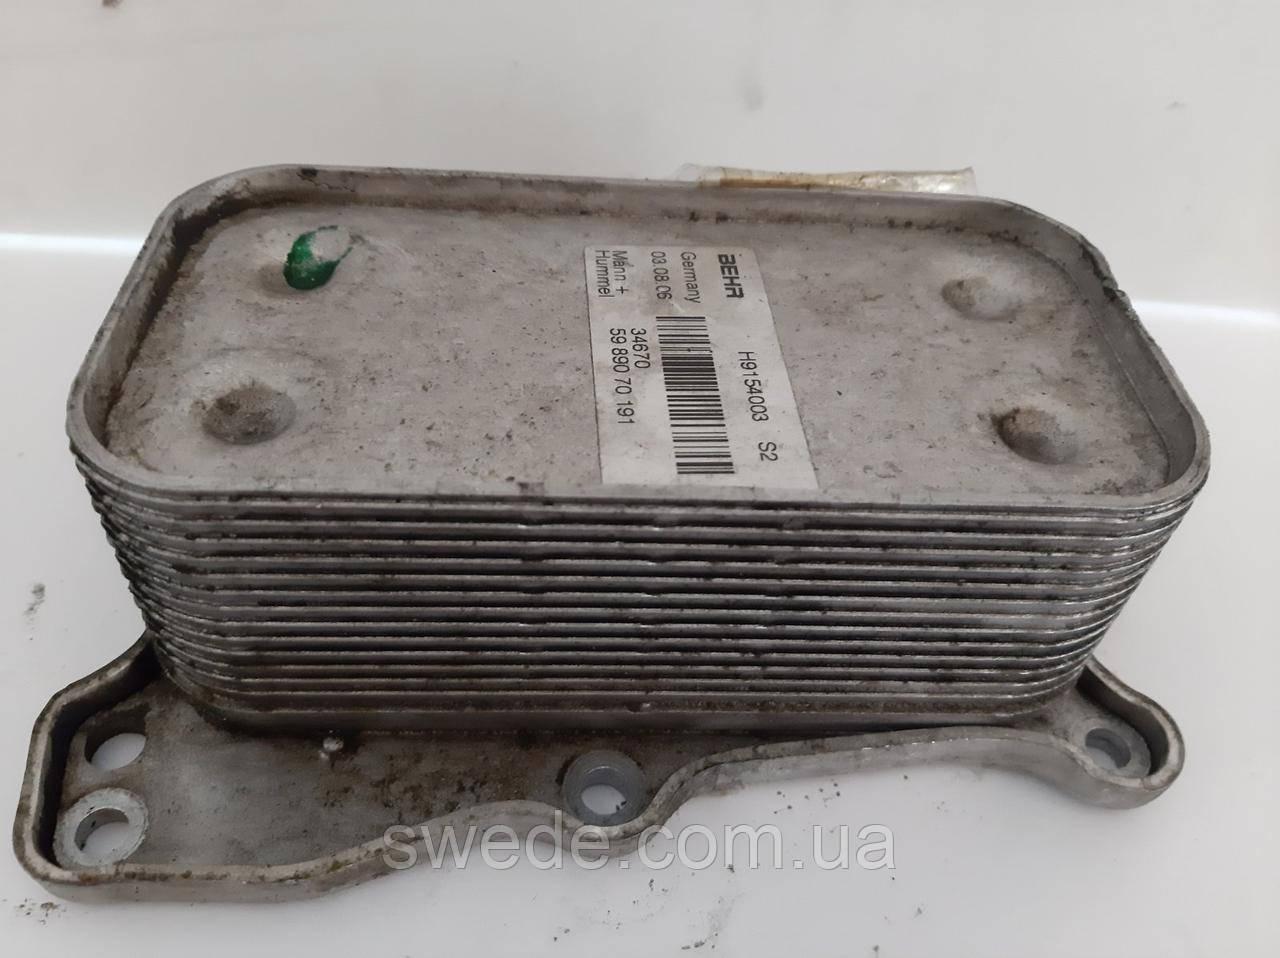 Радиатор масляный Mercedes ML W164 W251 W221 3.5 V6 5989070191